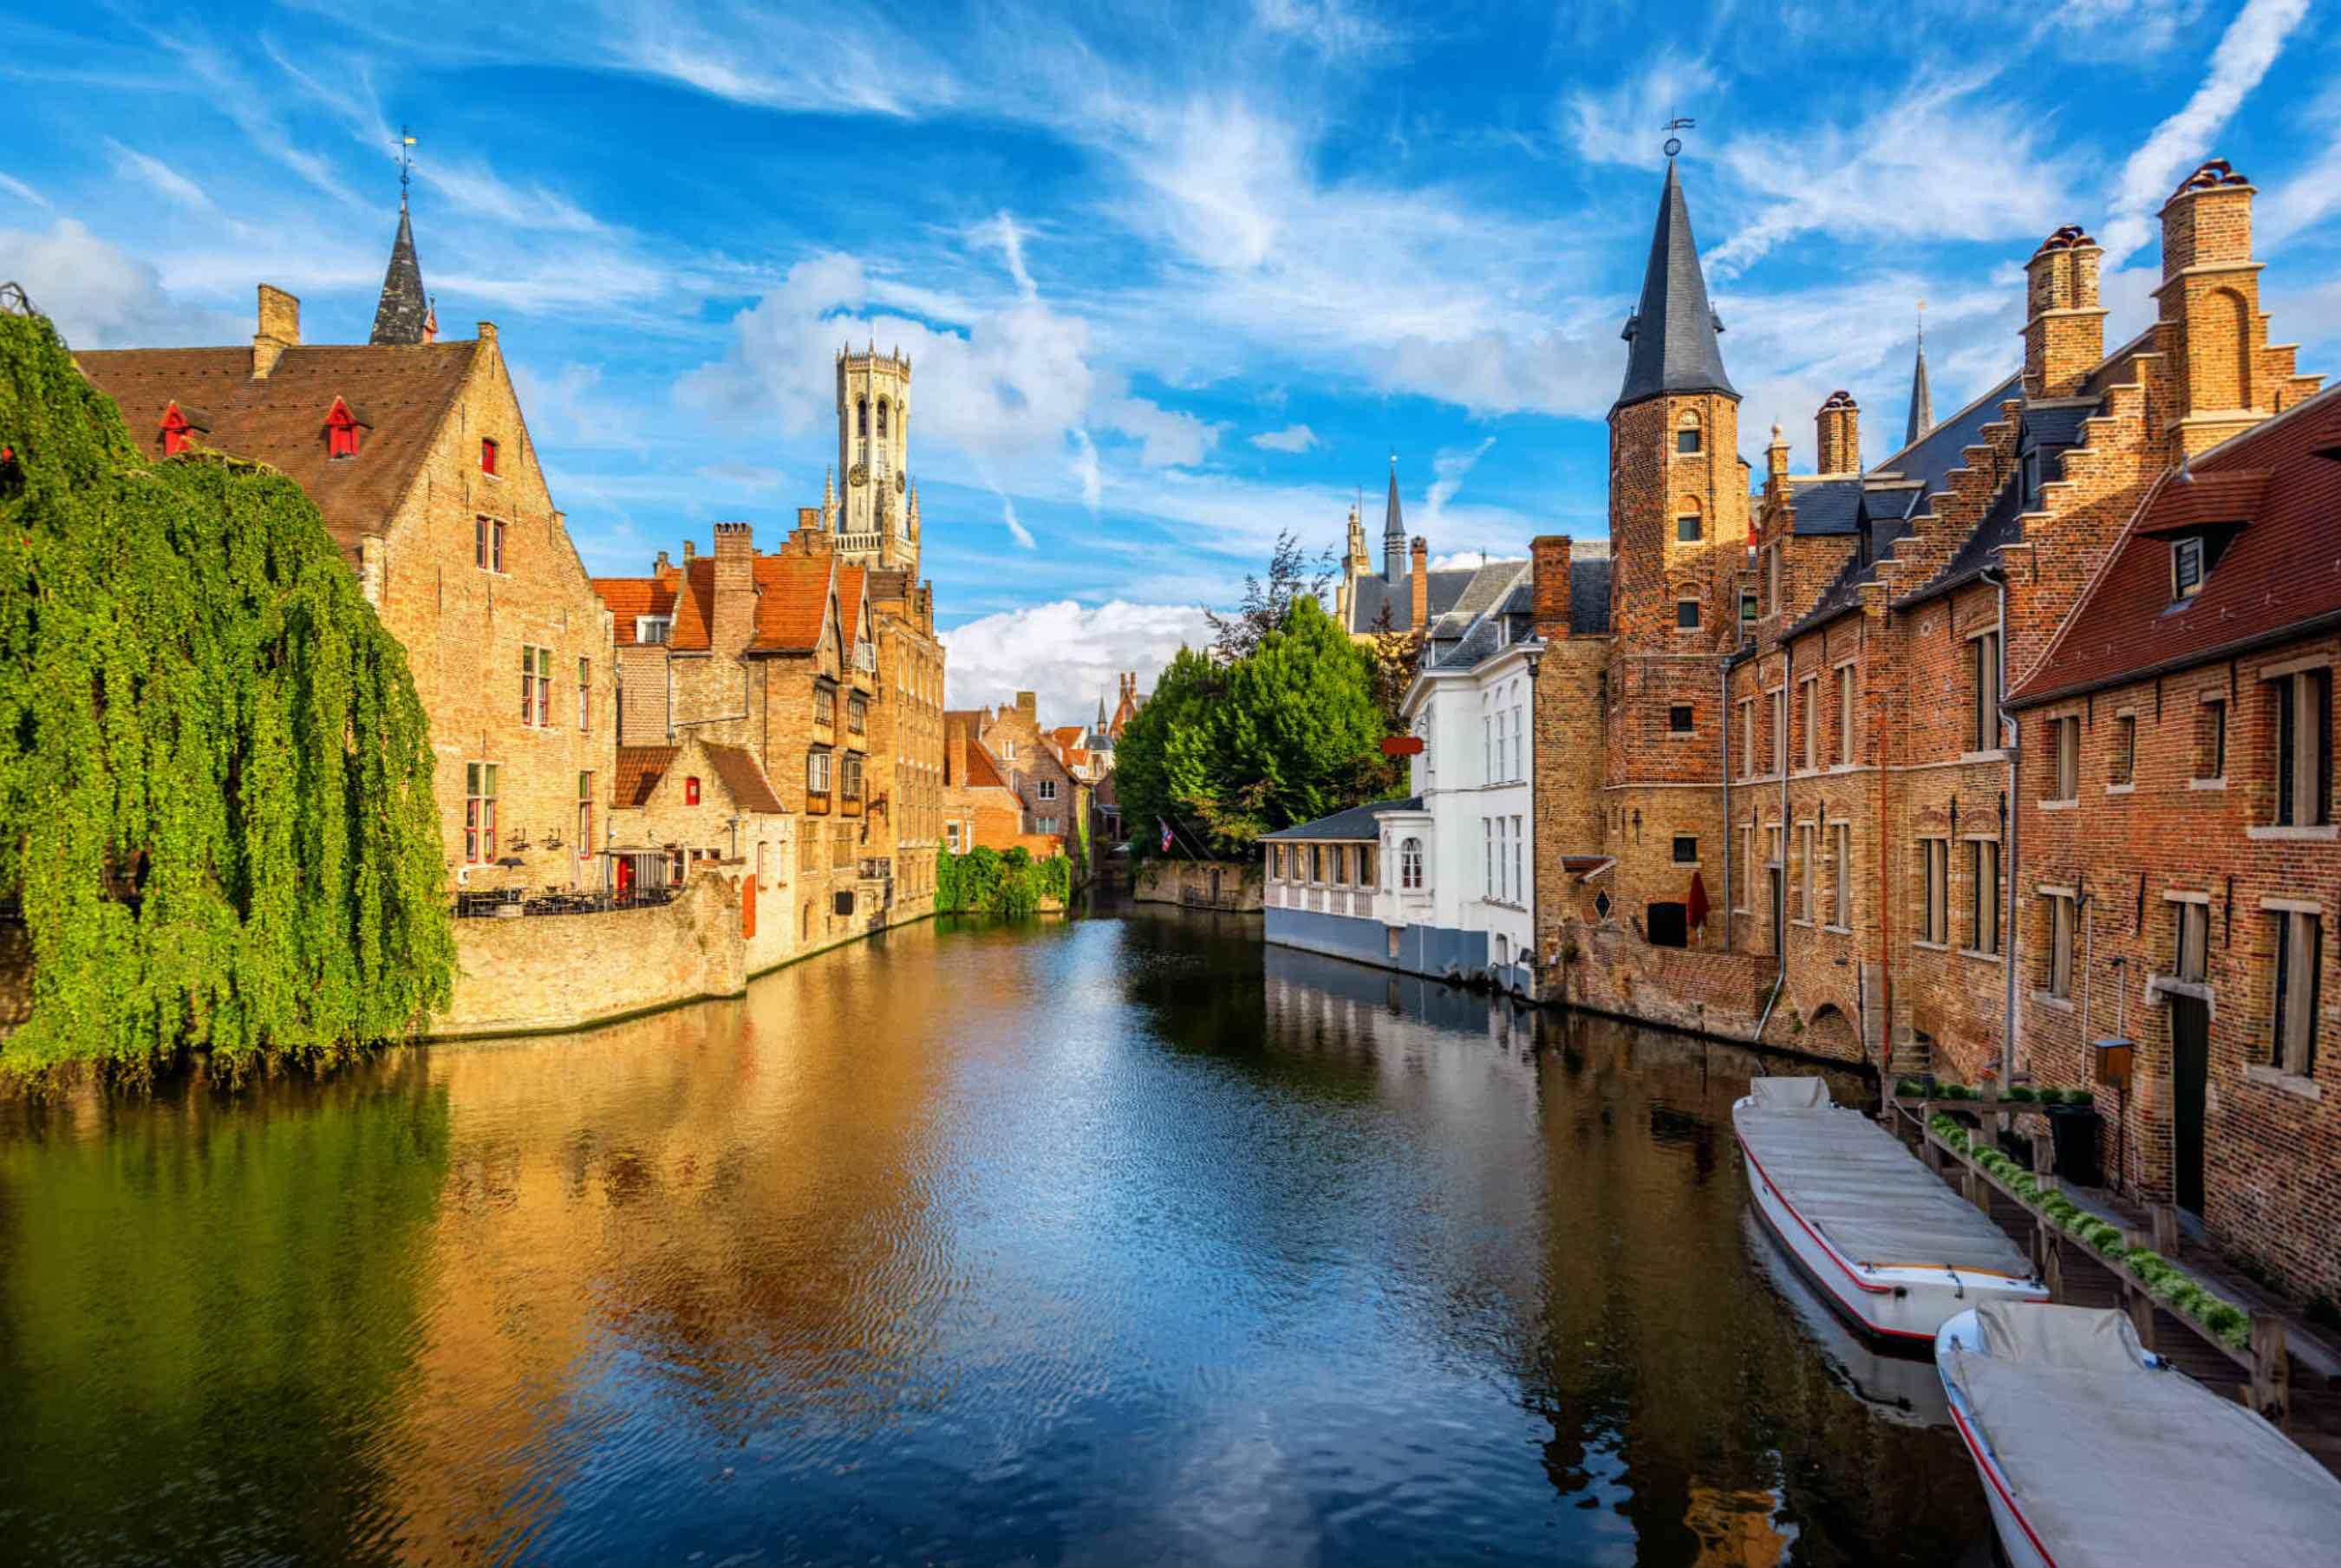 Kinh nghiệm du lịch Bỉ – New World Travel